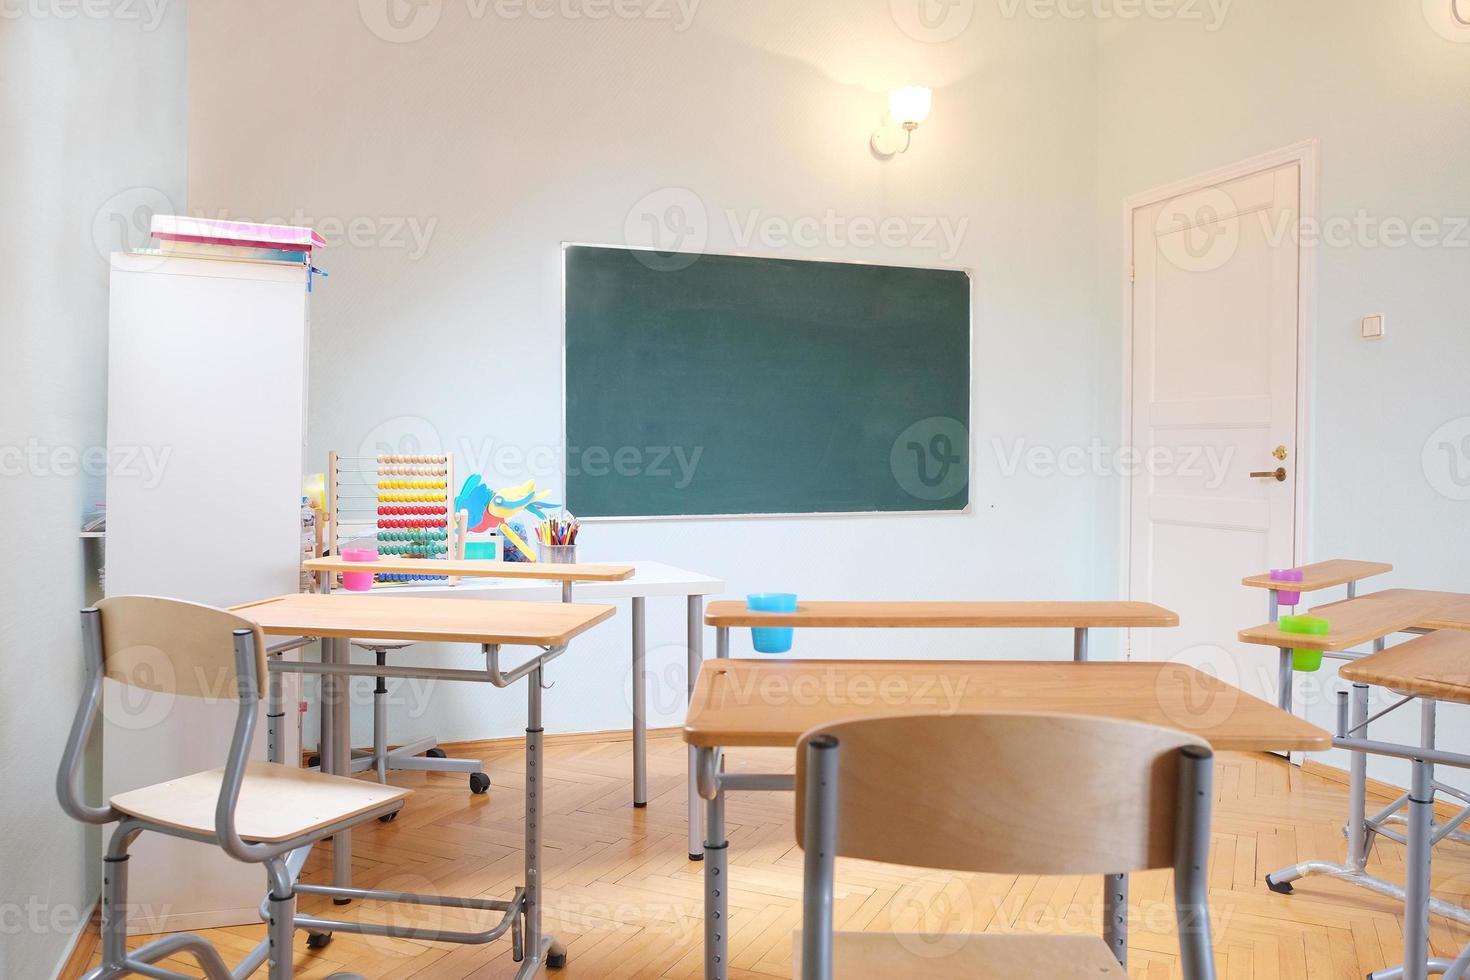 interior del aula foto